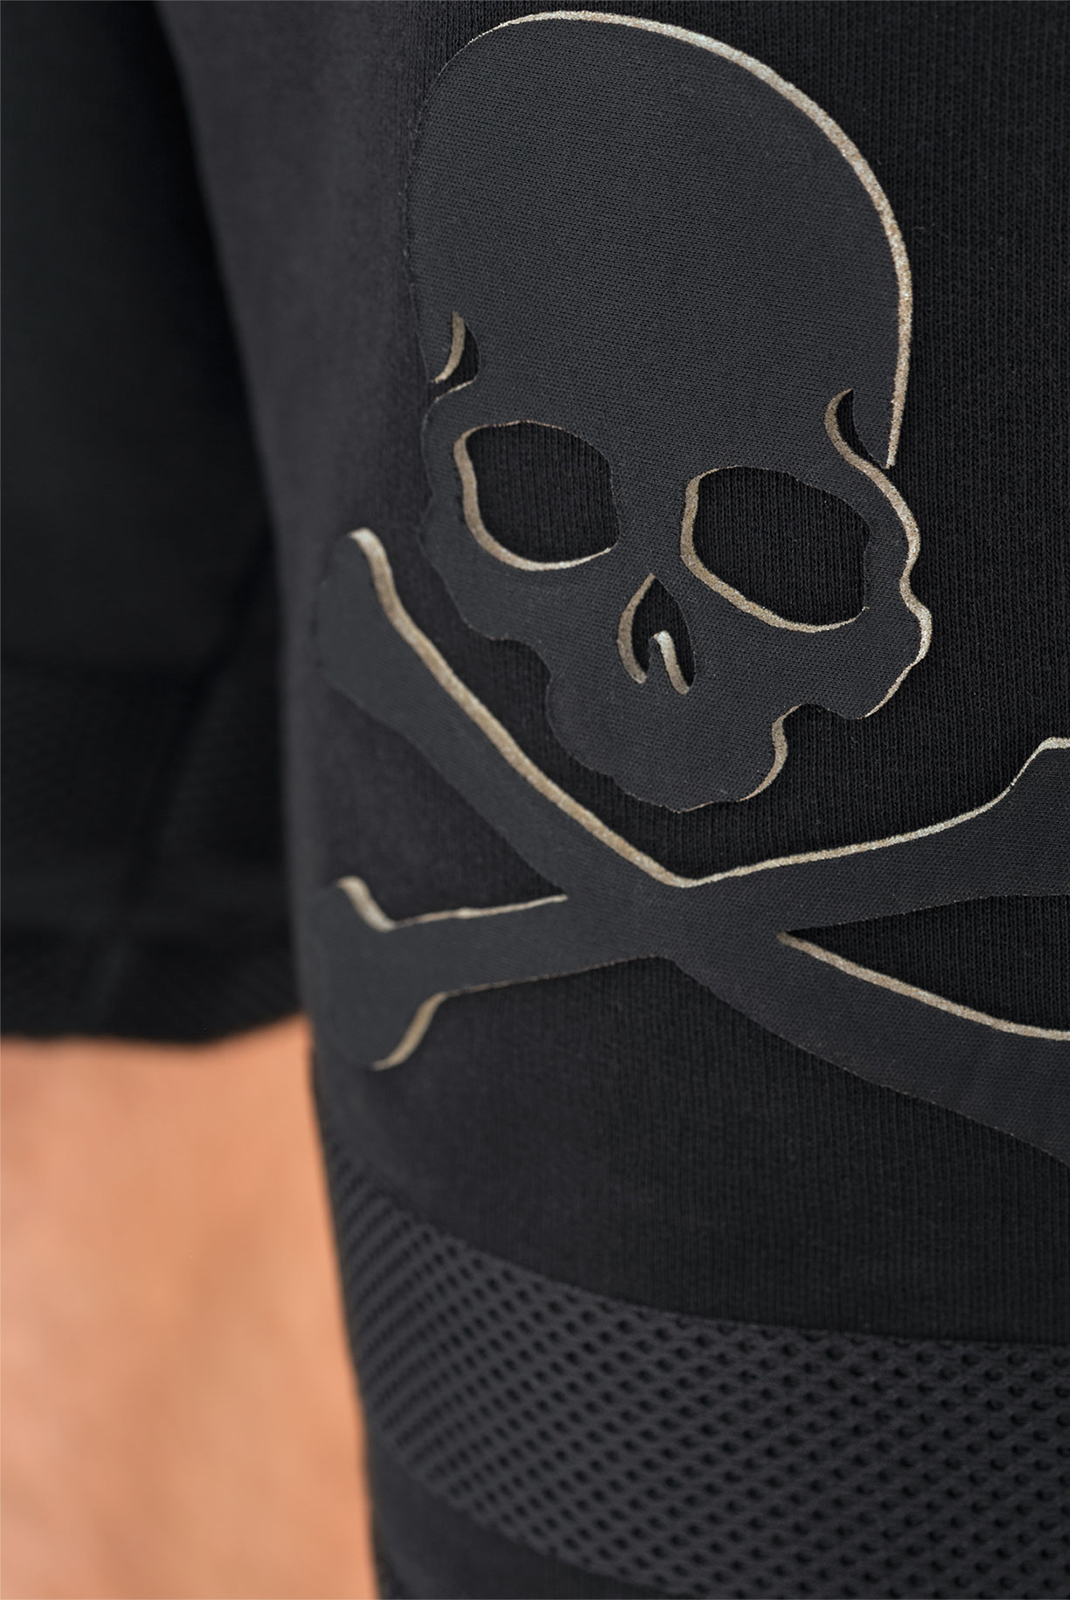 Shorts & Bermudas  Philipp plein MJT0095 JUNES 02 BLACK